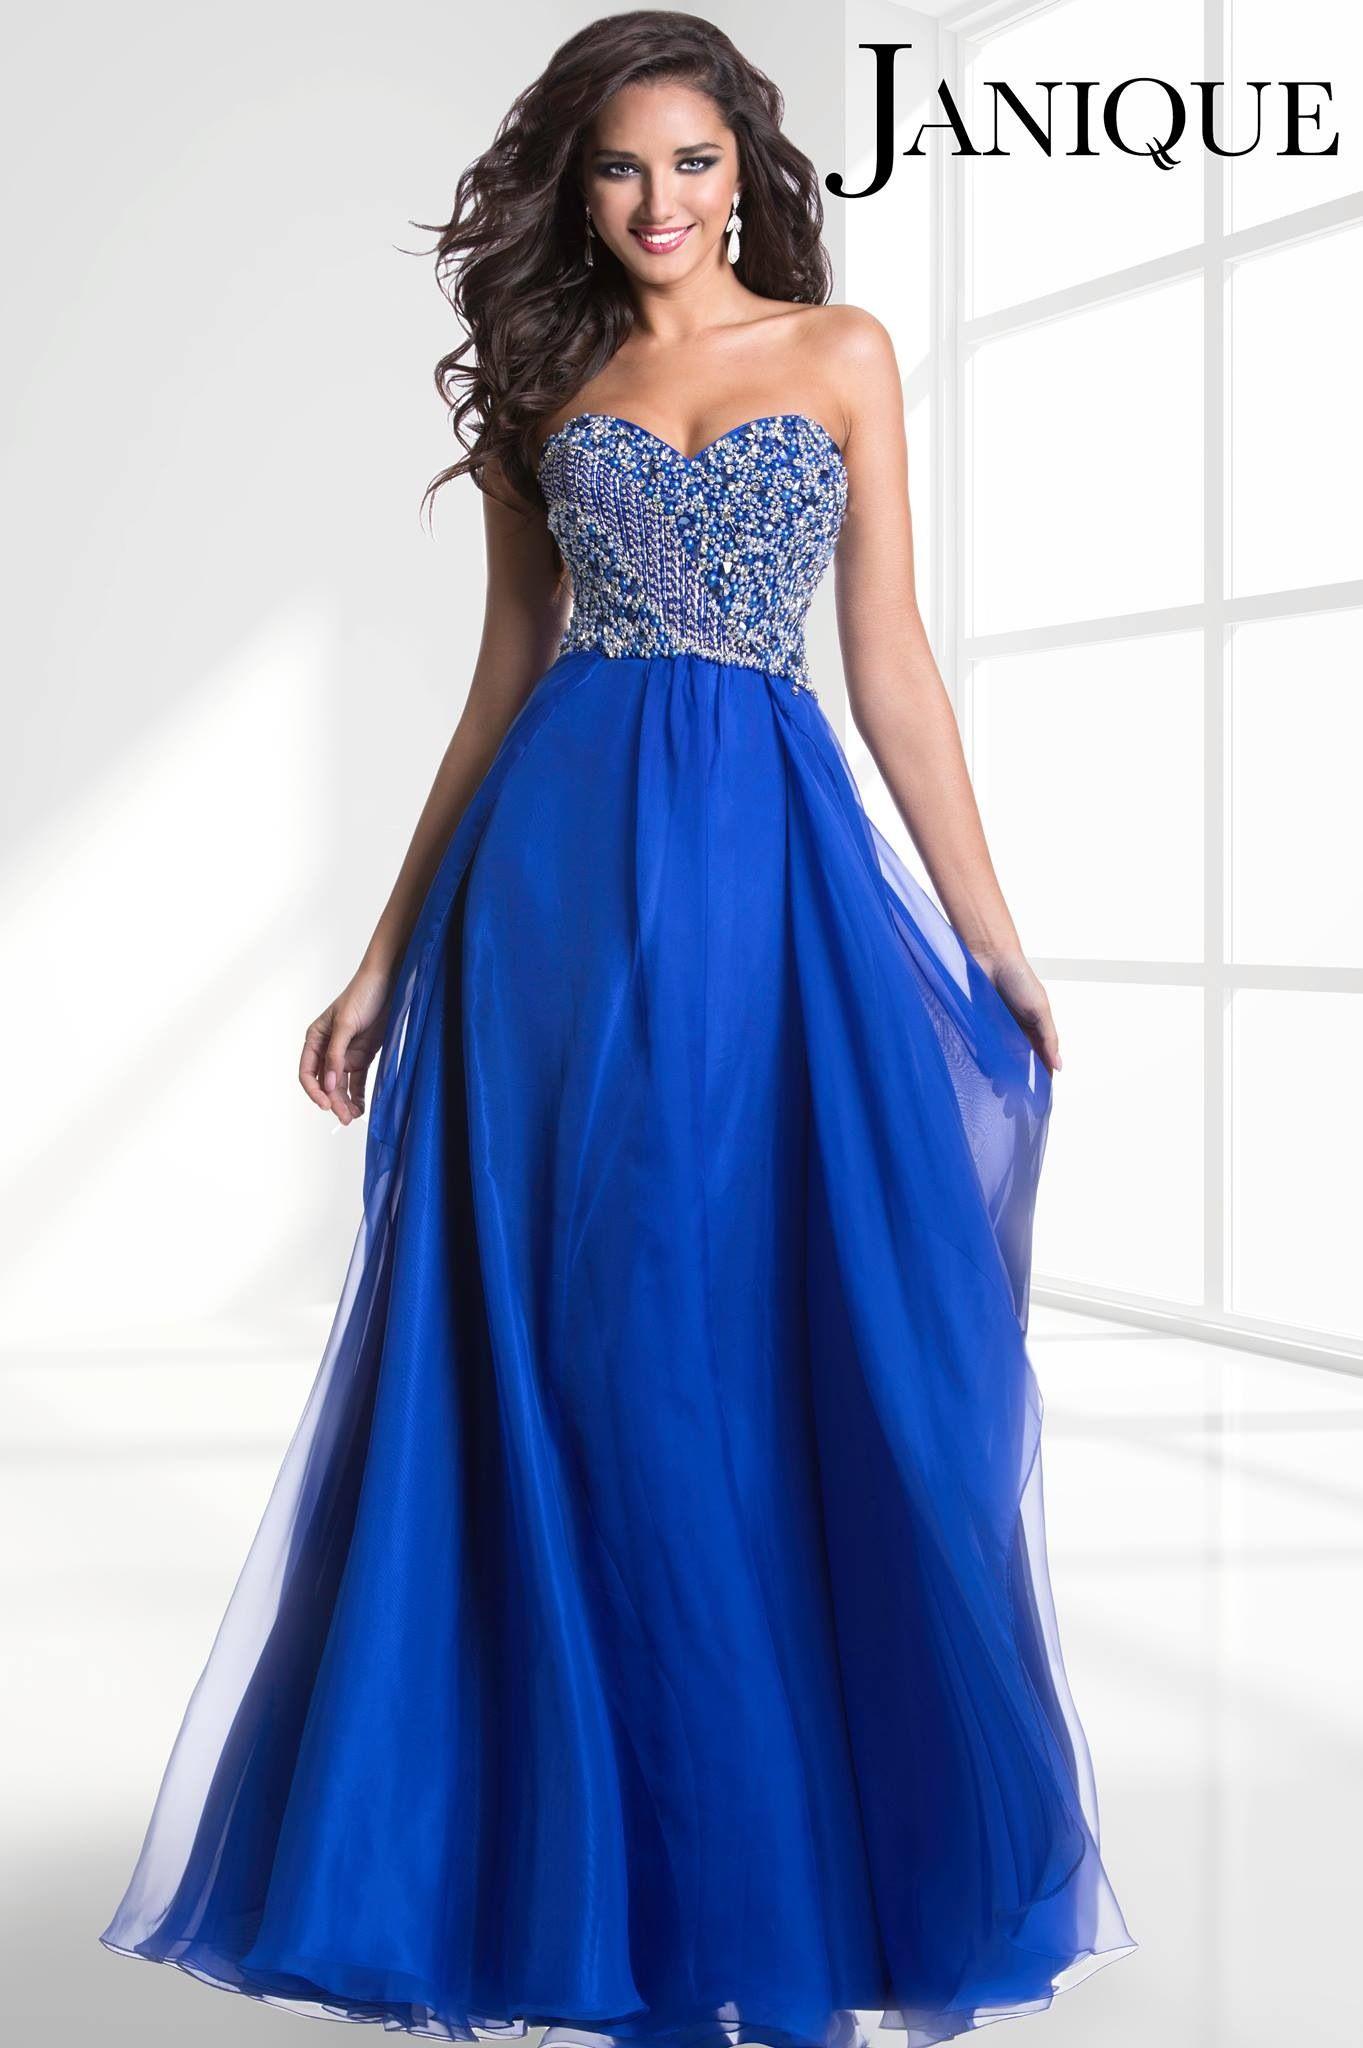 b8bf3e2a5 Vestidos para graduacion en azul rey - Vestido azul